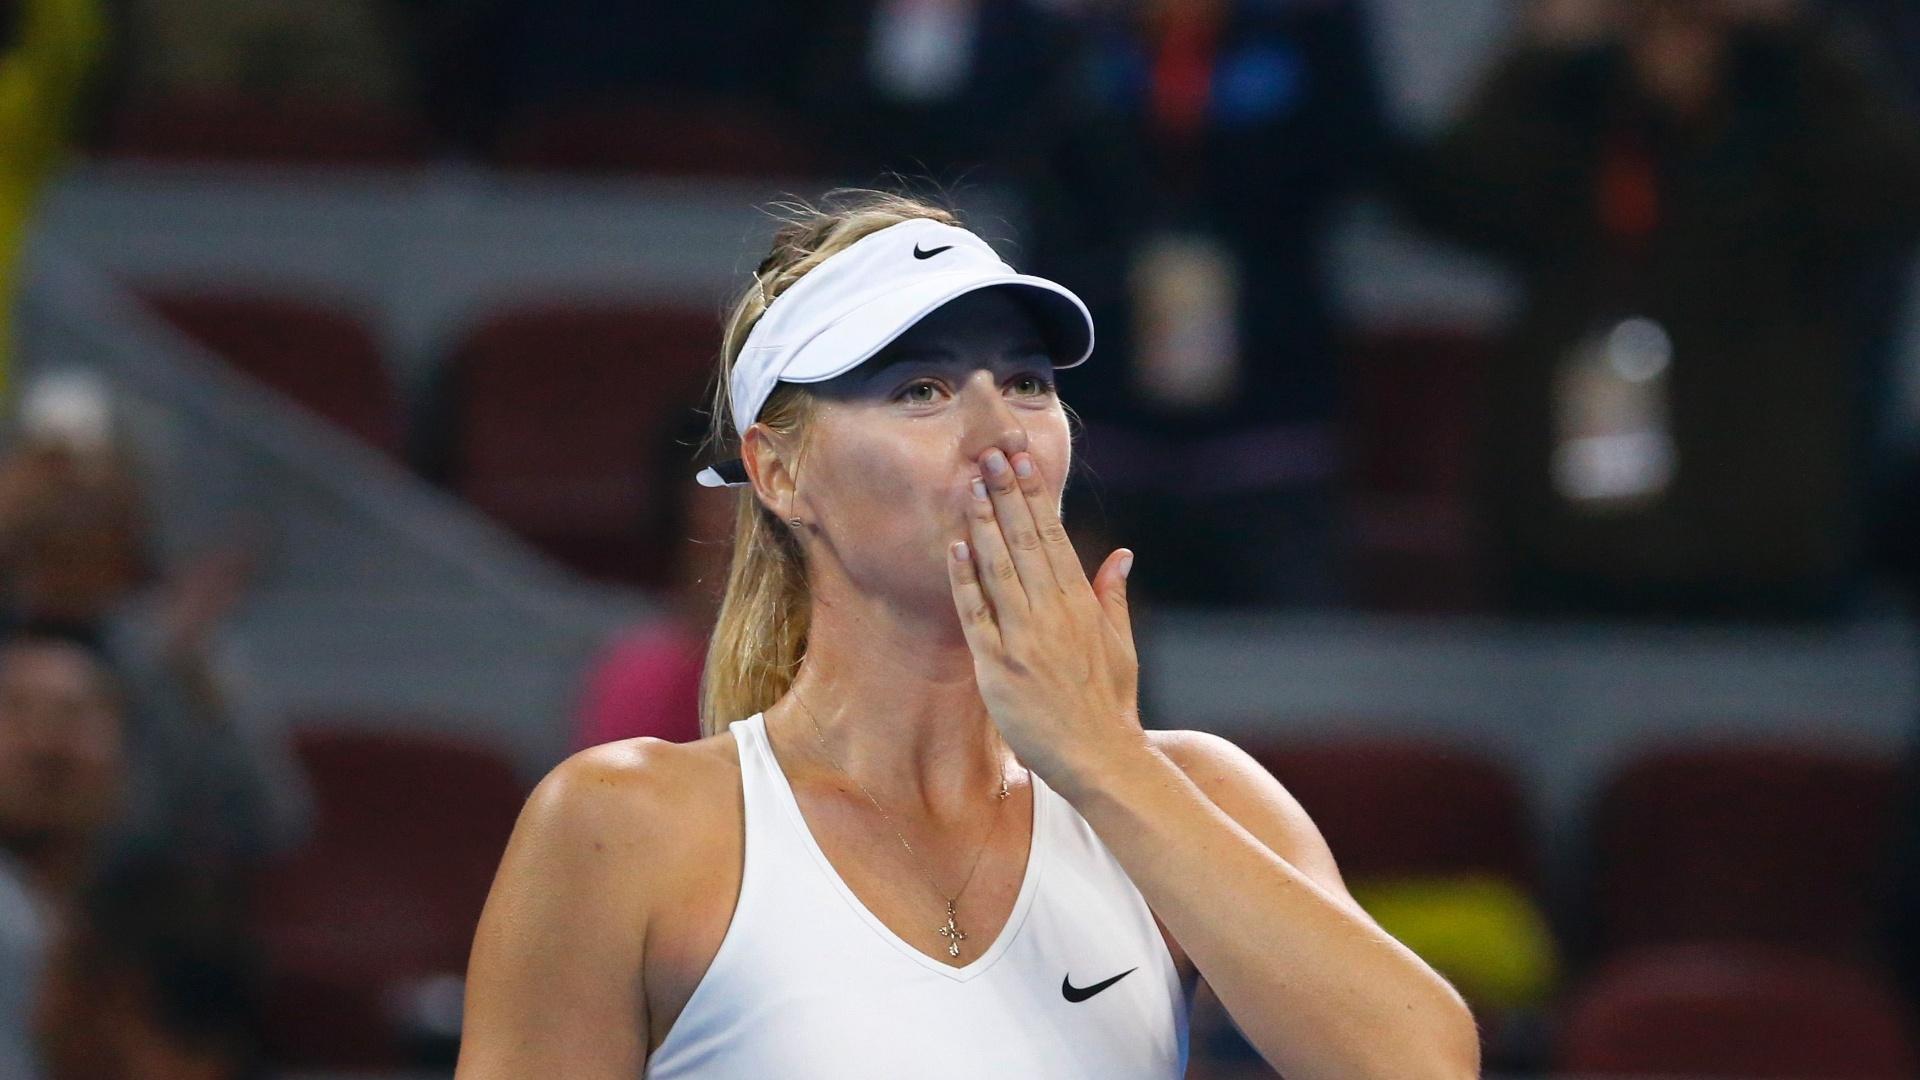 Maria Sharapova cumprimenta a torcida após vitória sobre Ana Ivanovic